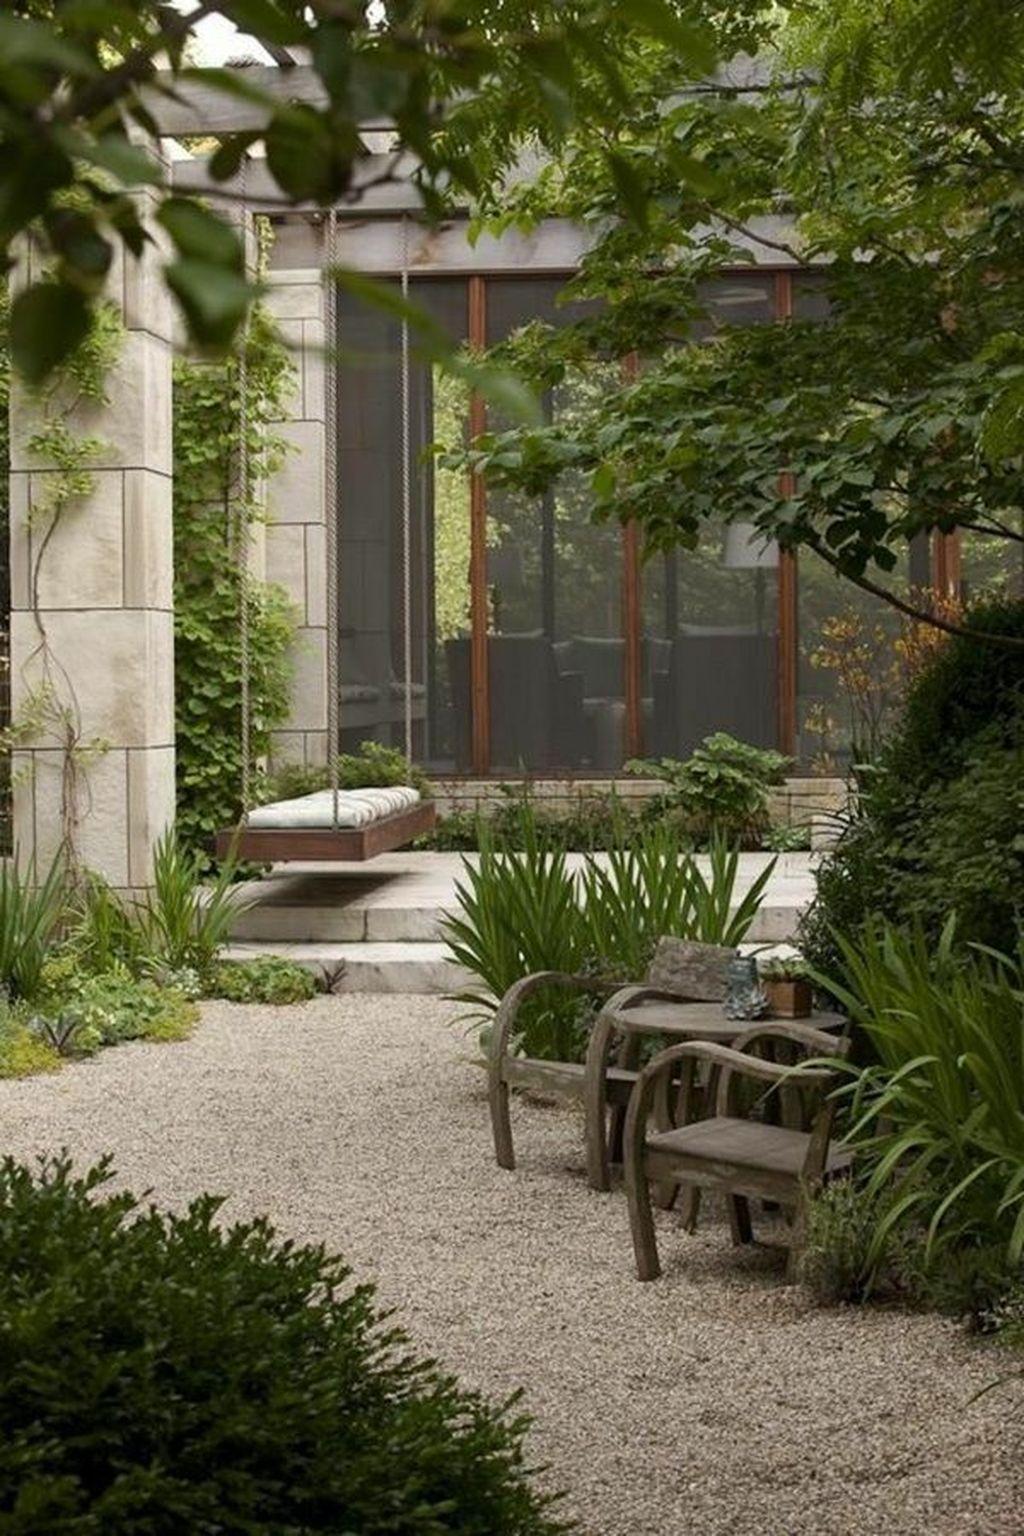 Elegant Terraced Backyard Design Ideas To Makes Your Home Cozy 29